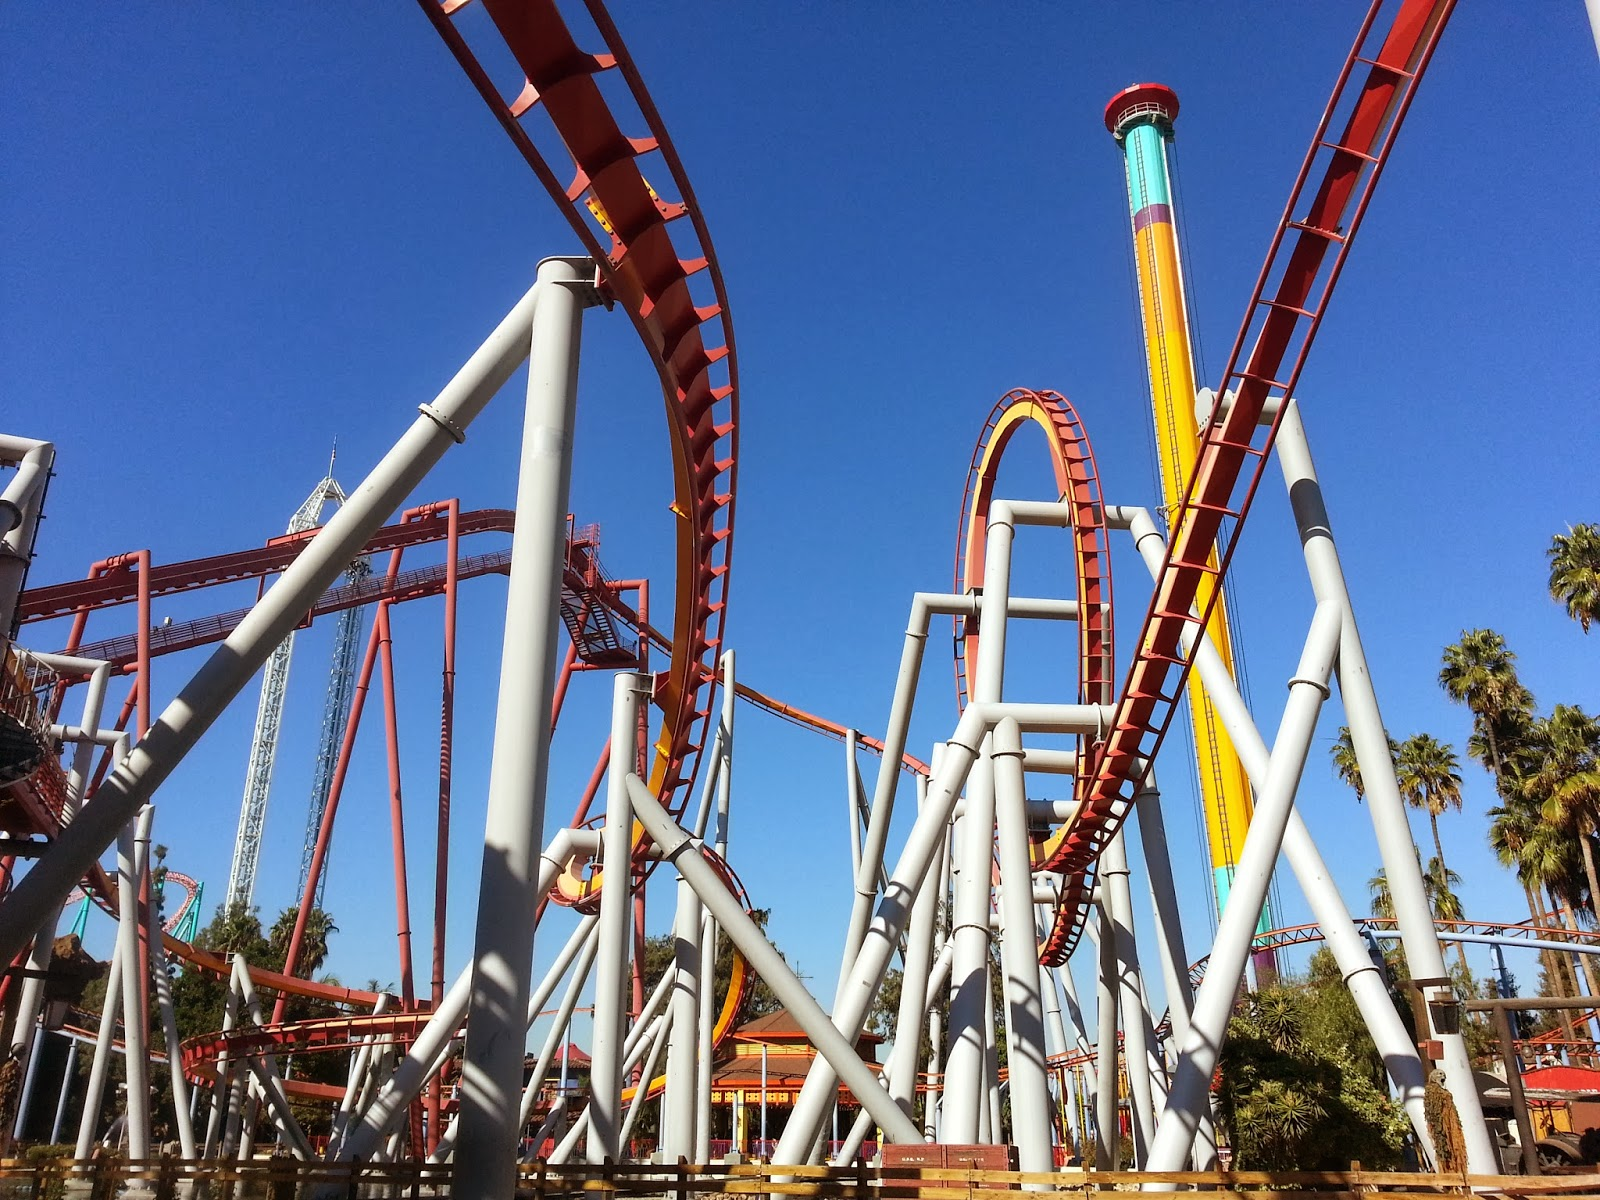 jaguar roller coaster - photo #32